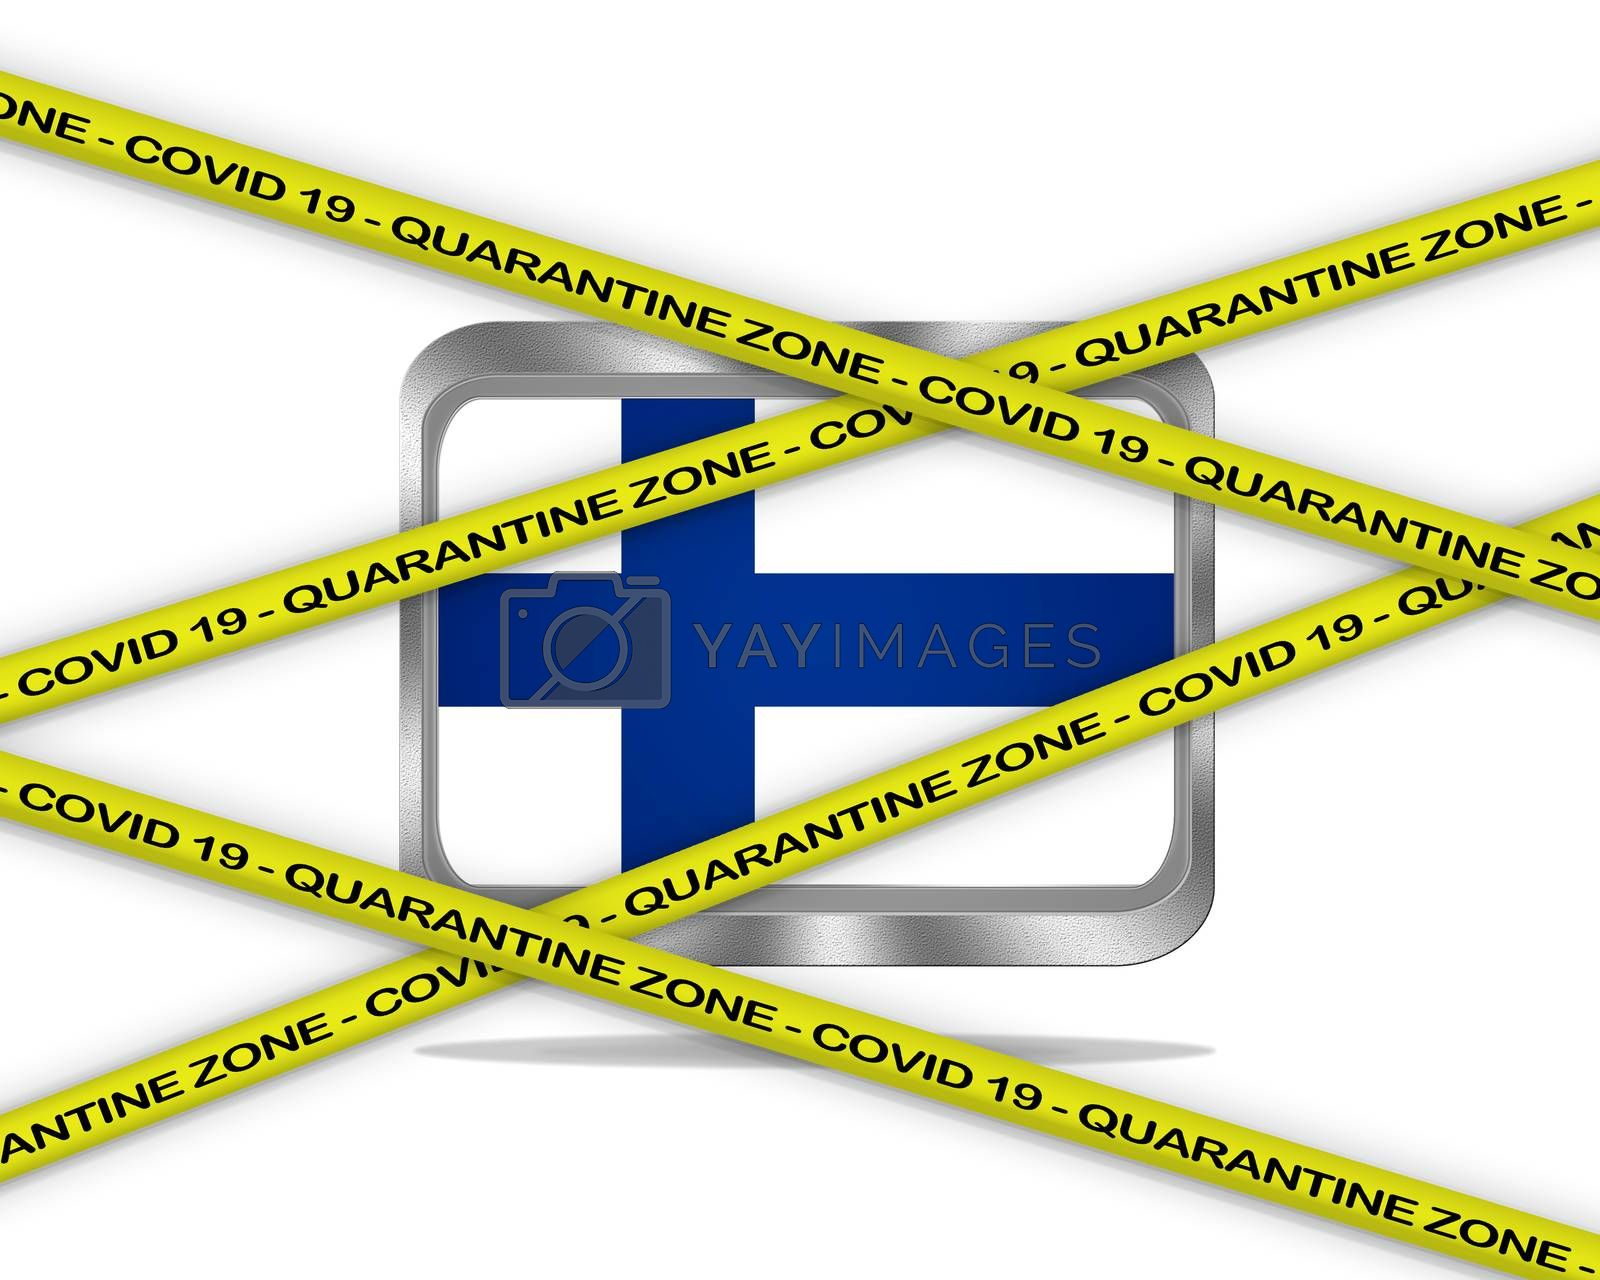 COVID-19 warning yellow ribbon written with: Quarantine zone Cover 19 on Finland flag illustration. Coronavirus danger area, quarantined country.